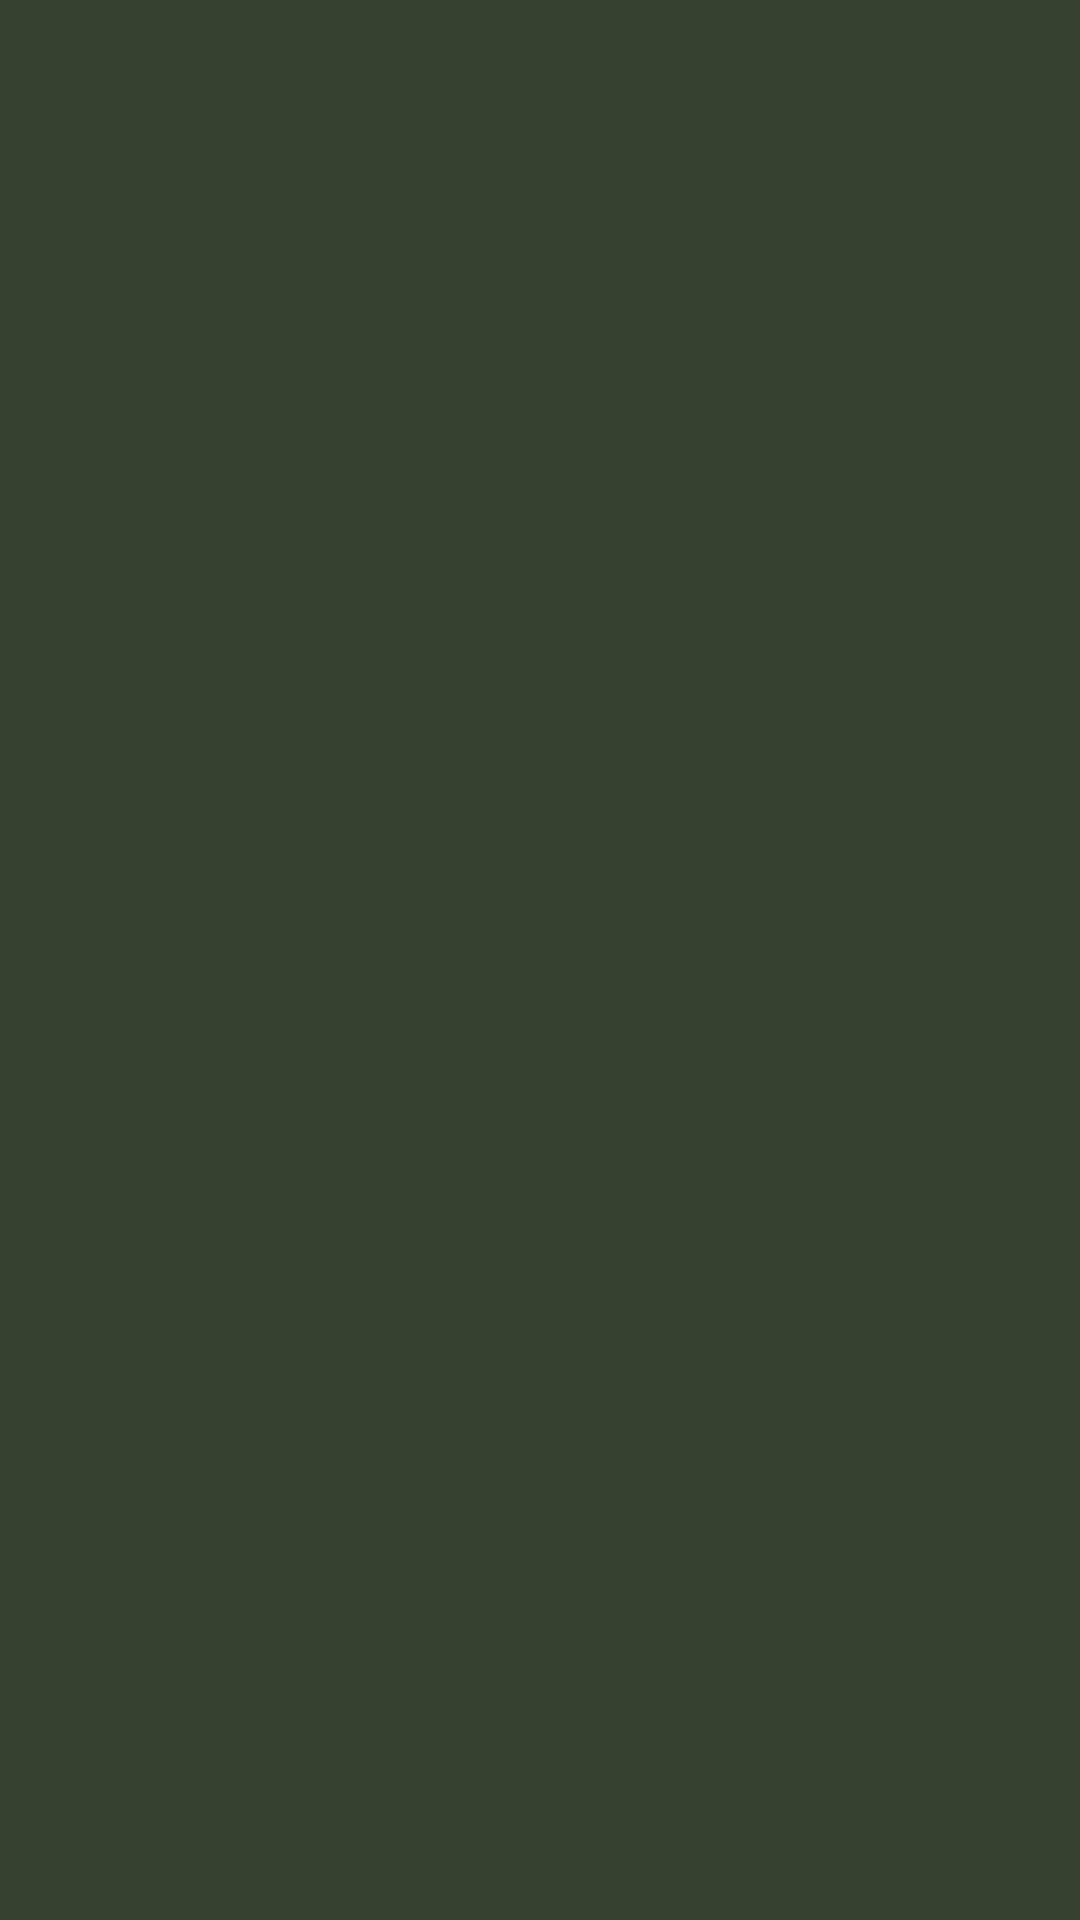 1080x1920 Kombu Green Solid Color Background